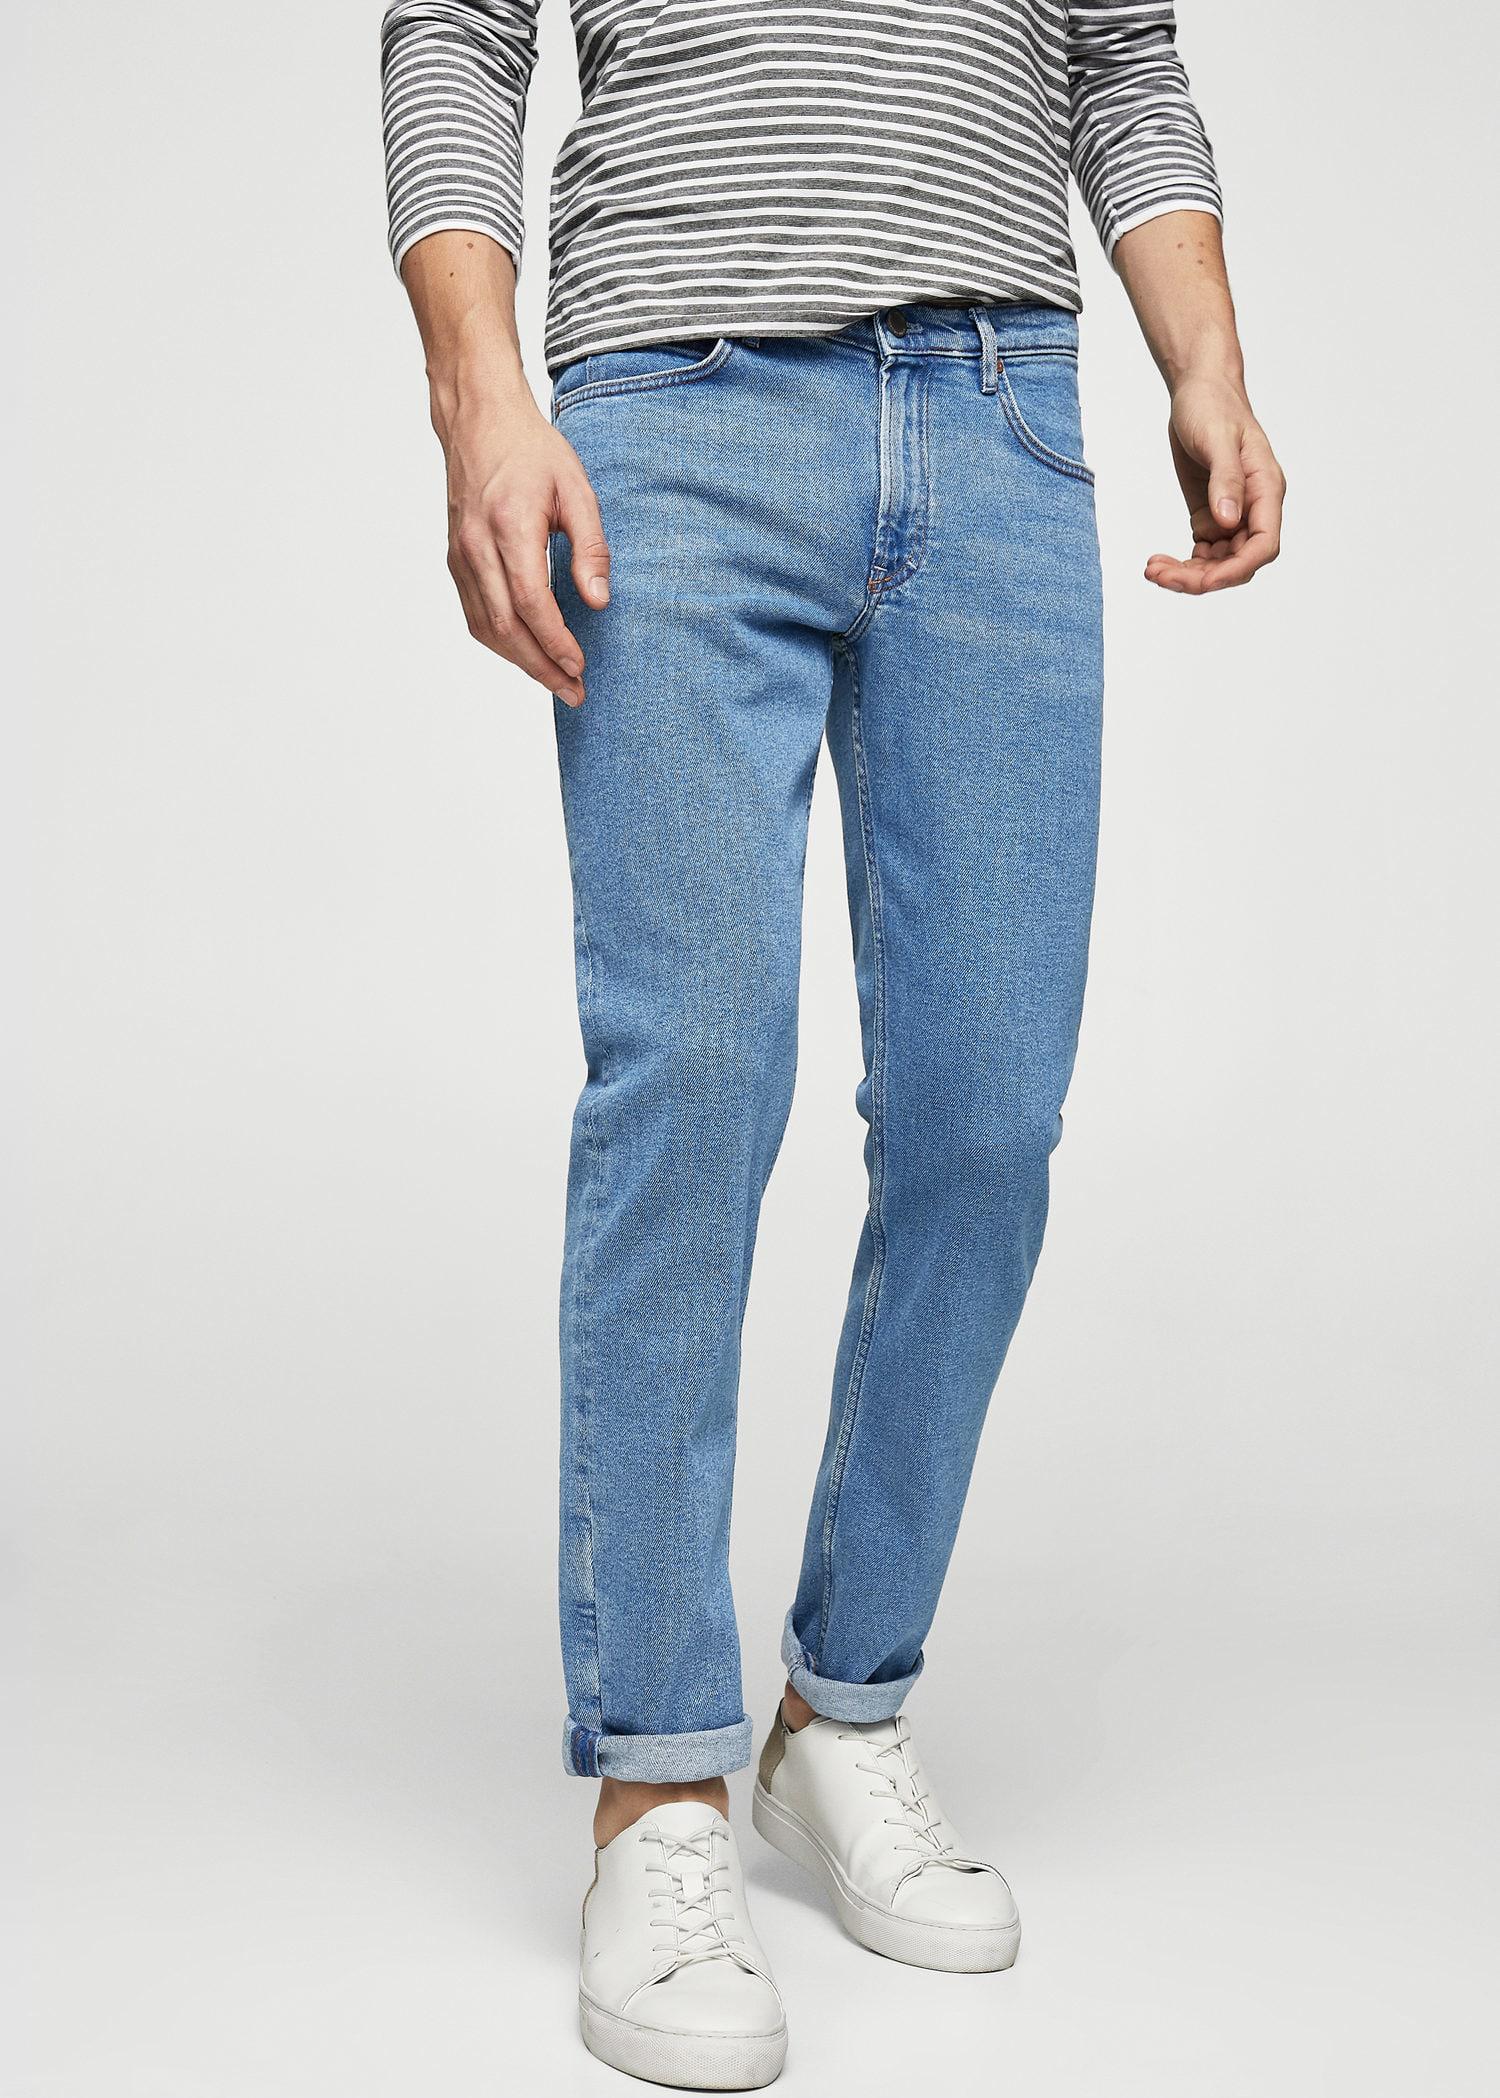 Mango Slim Fit Medium Wash Patrick Jeans In Blue For Men